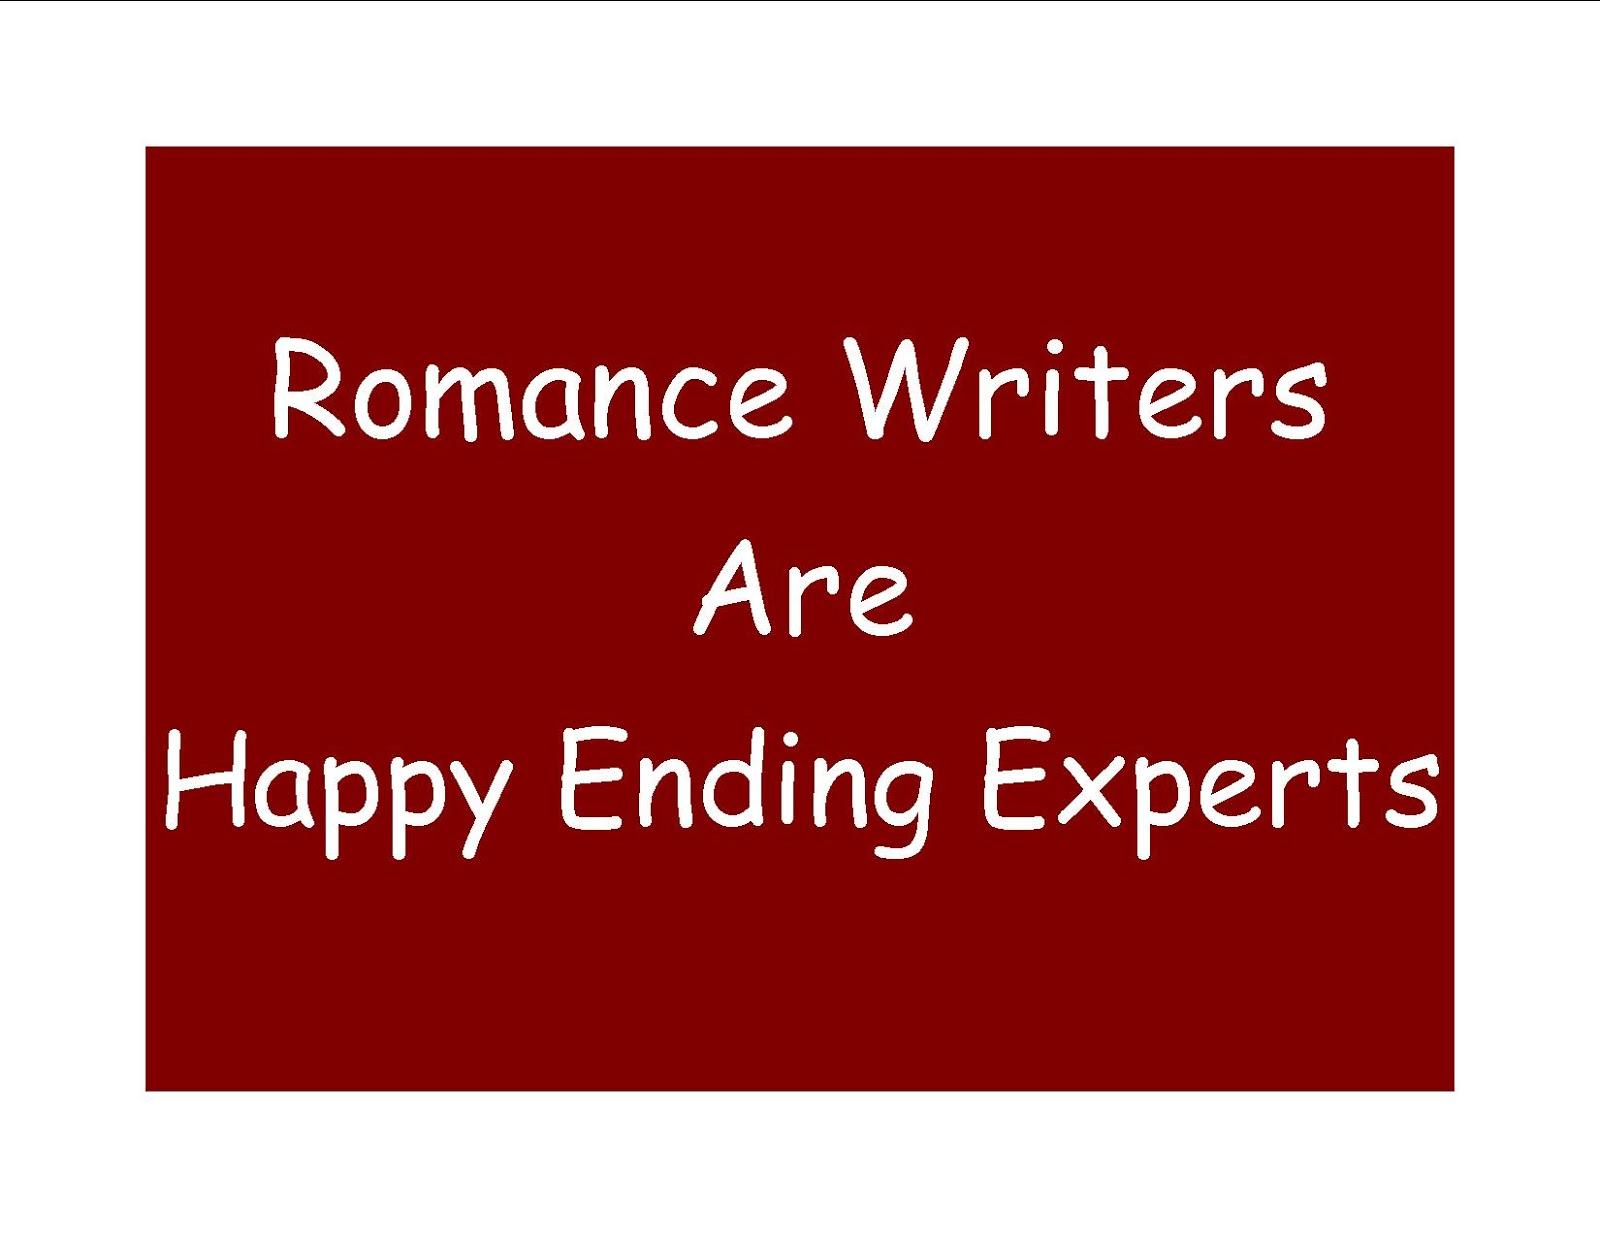 Romance Writers